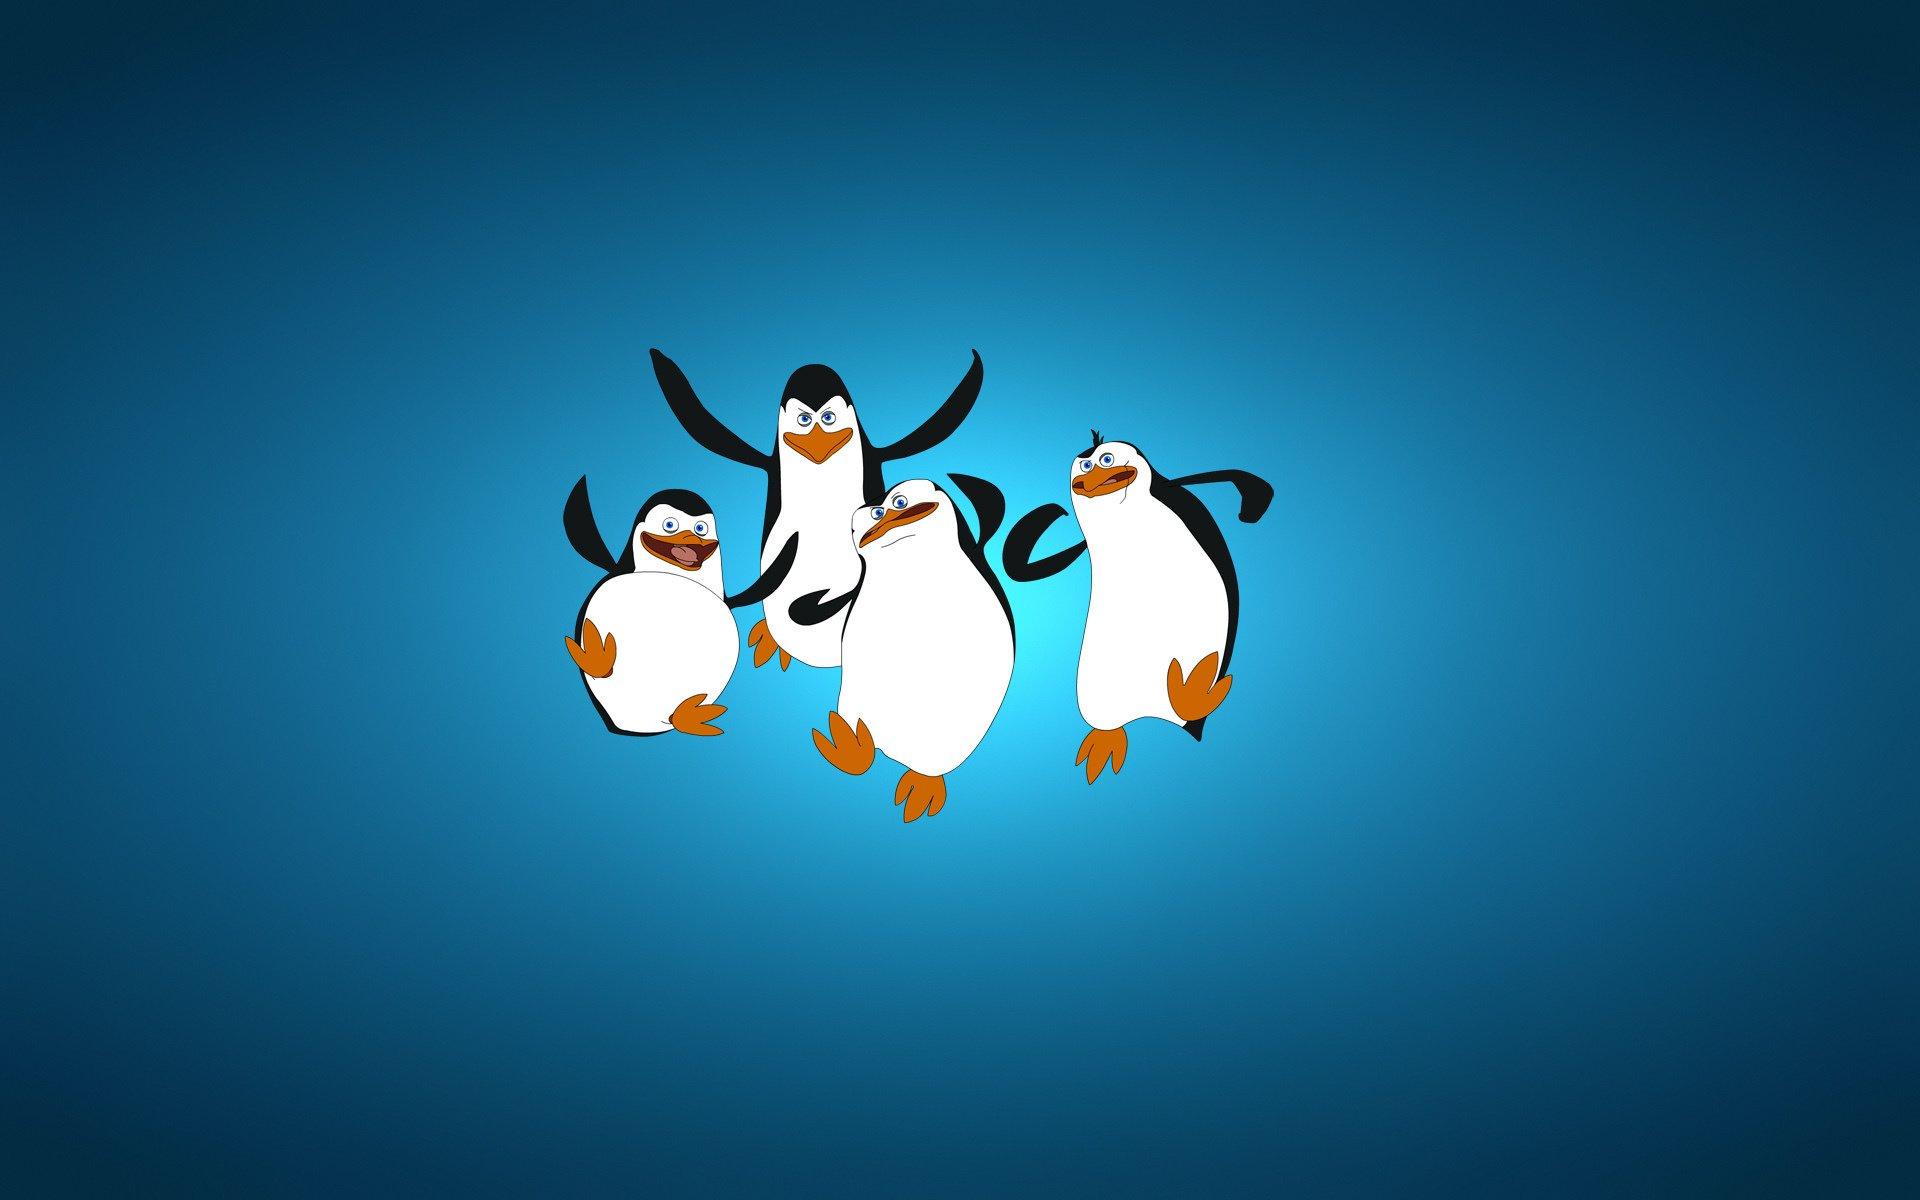 penguins of madagascar penguin wallpaper | 1920x1200 | 348228